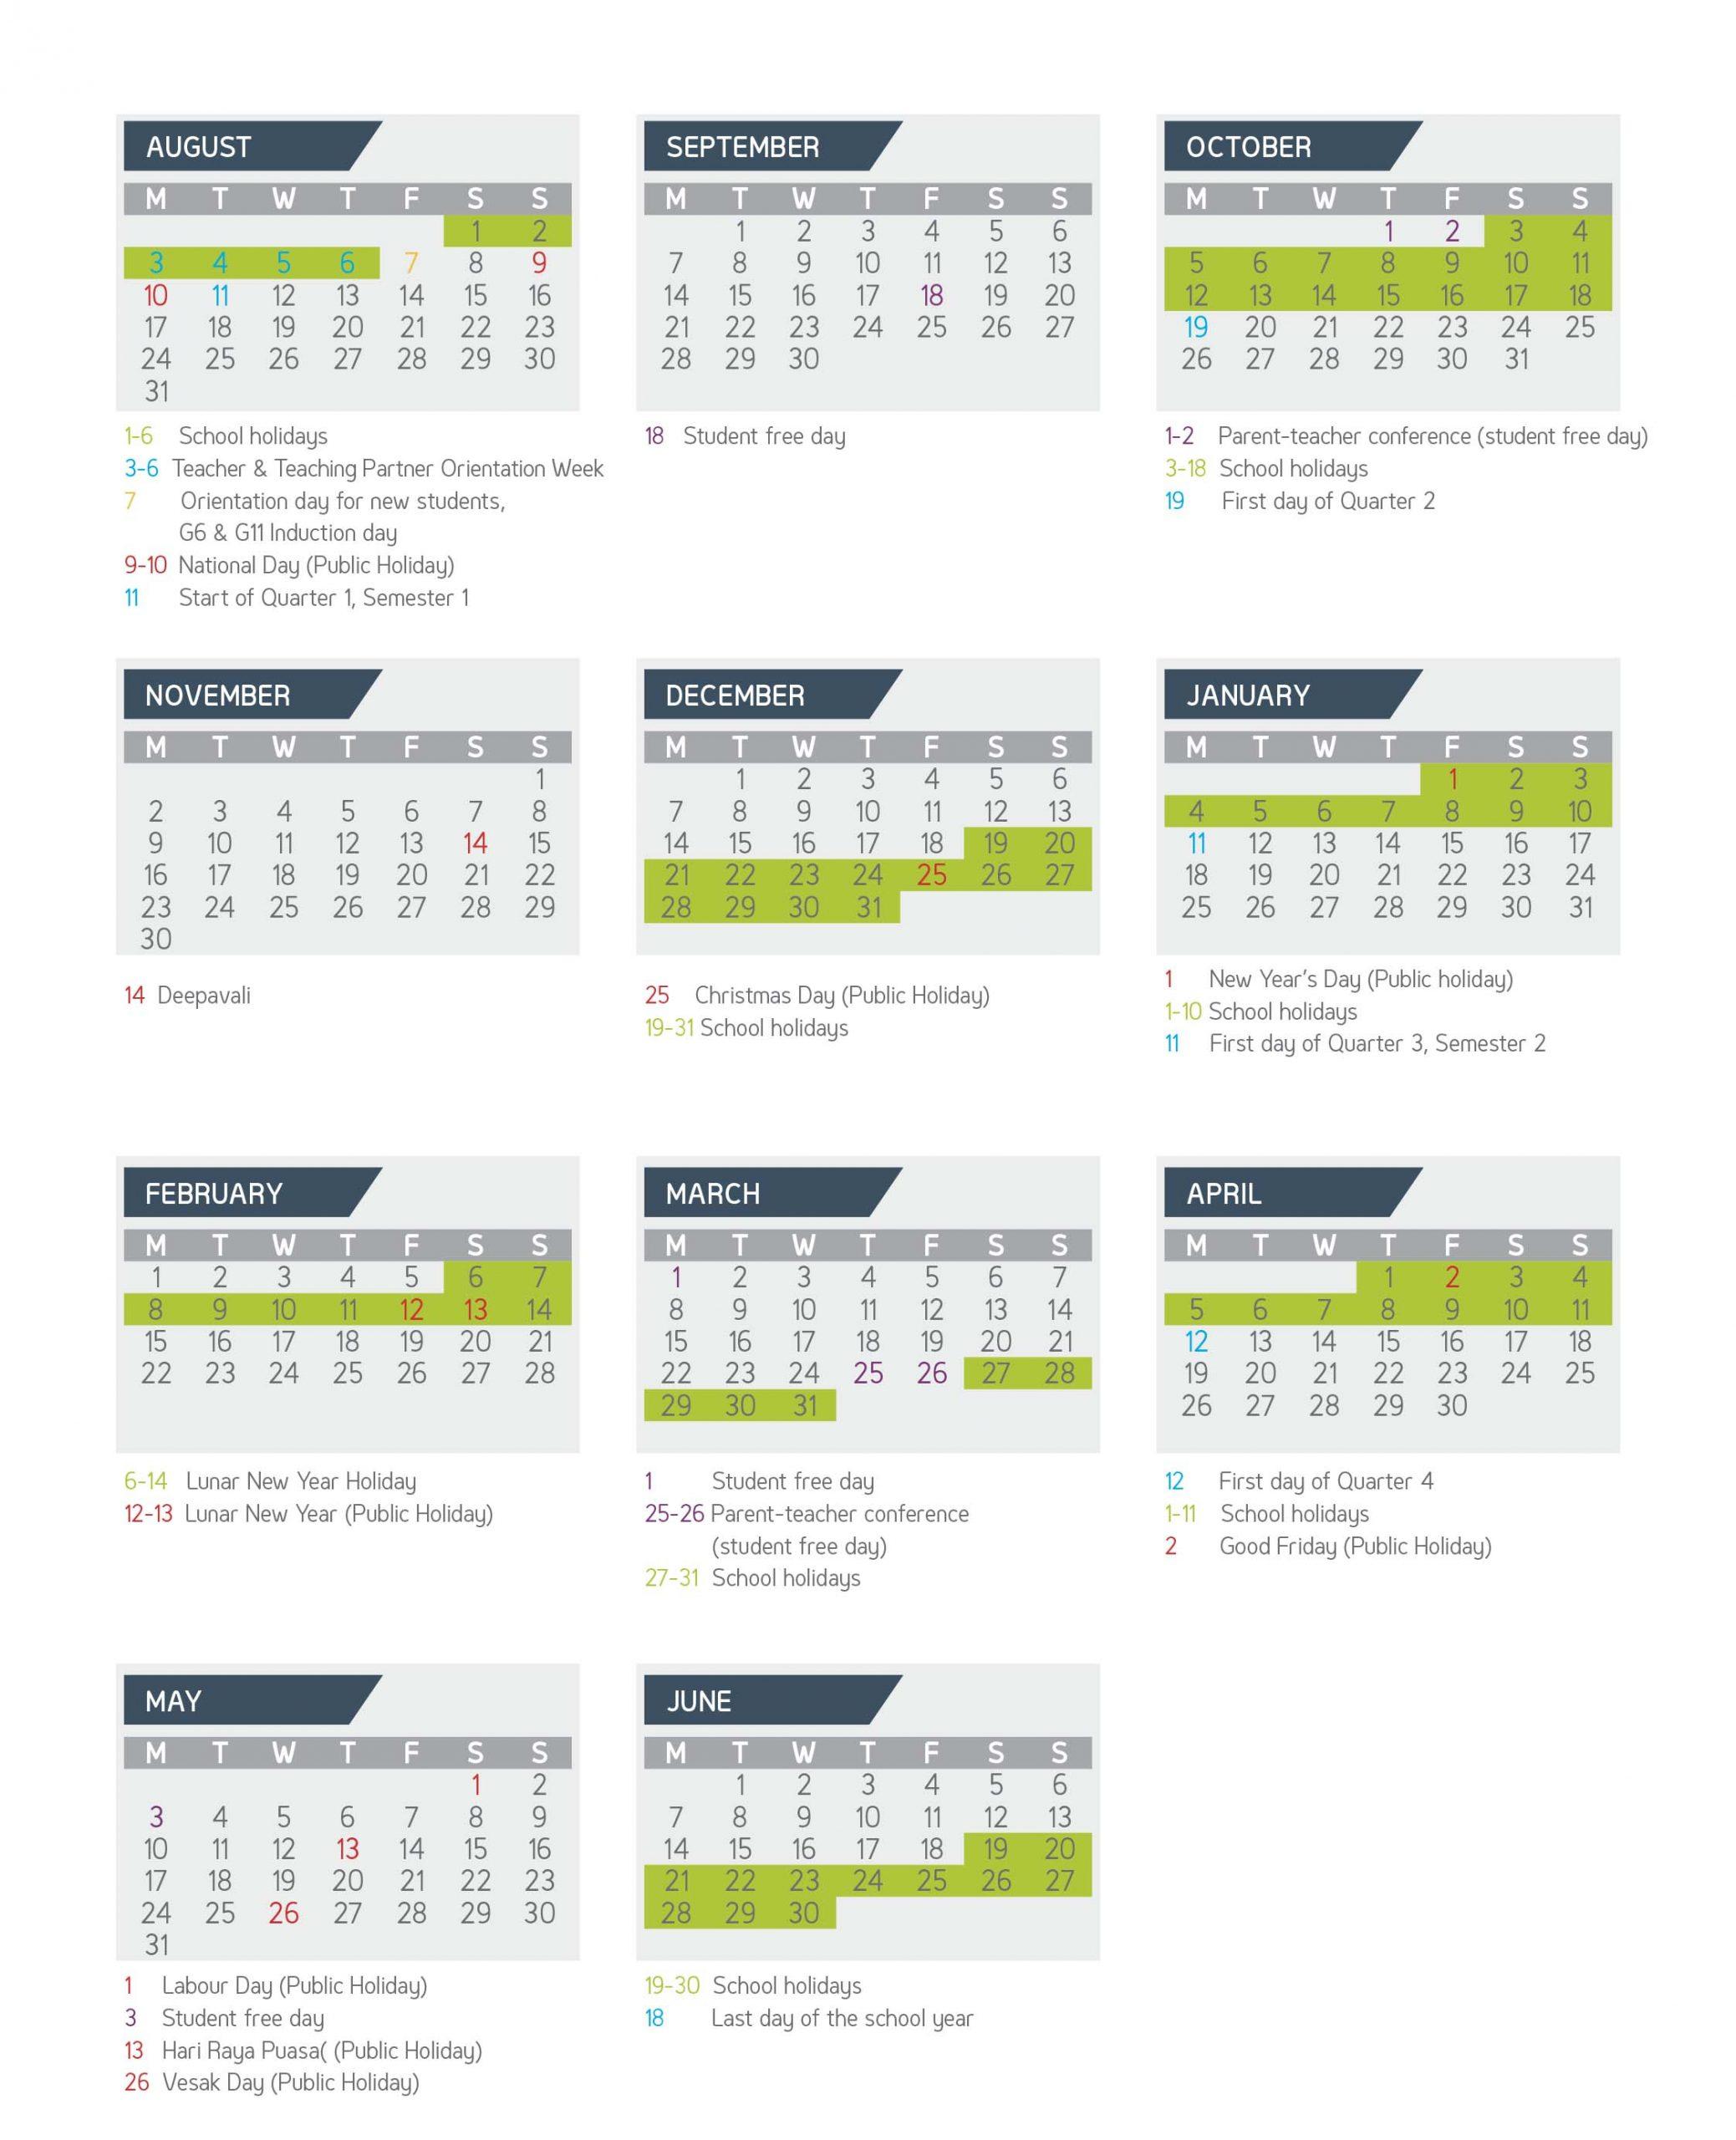 Academy 1 Jersey City Public School Calendar   Printable With Las Cruces Public School Calendar 2021